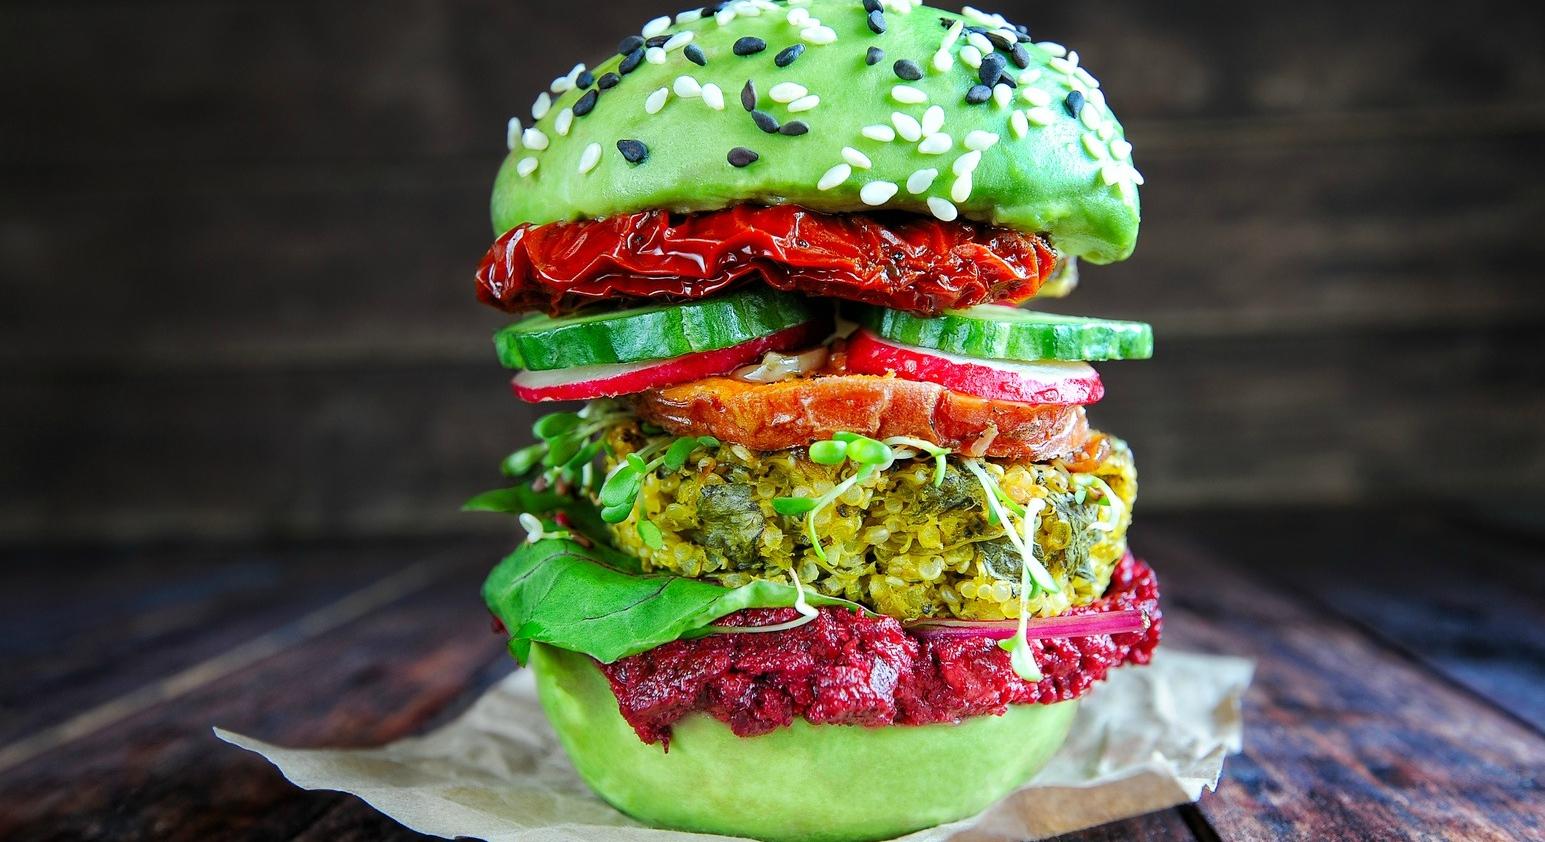 Vegan Διατροφή: Φυτικές τροφές με υψηλή περιεκτικότητα σε πρωτεΐνες